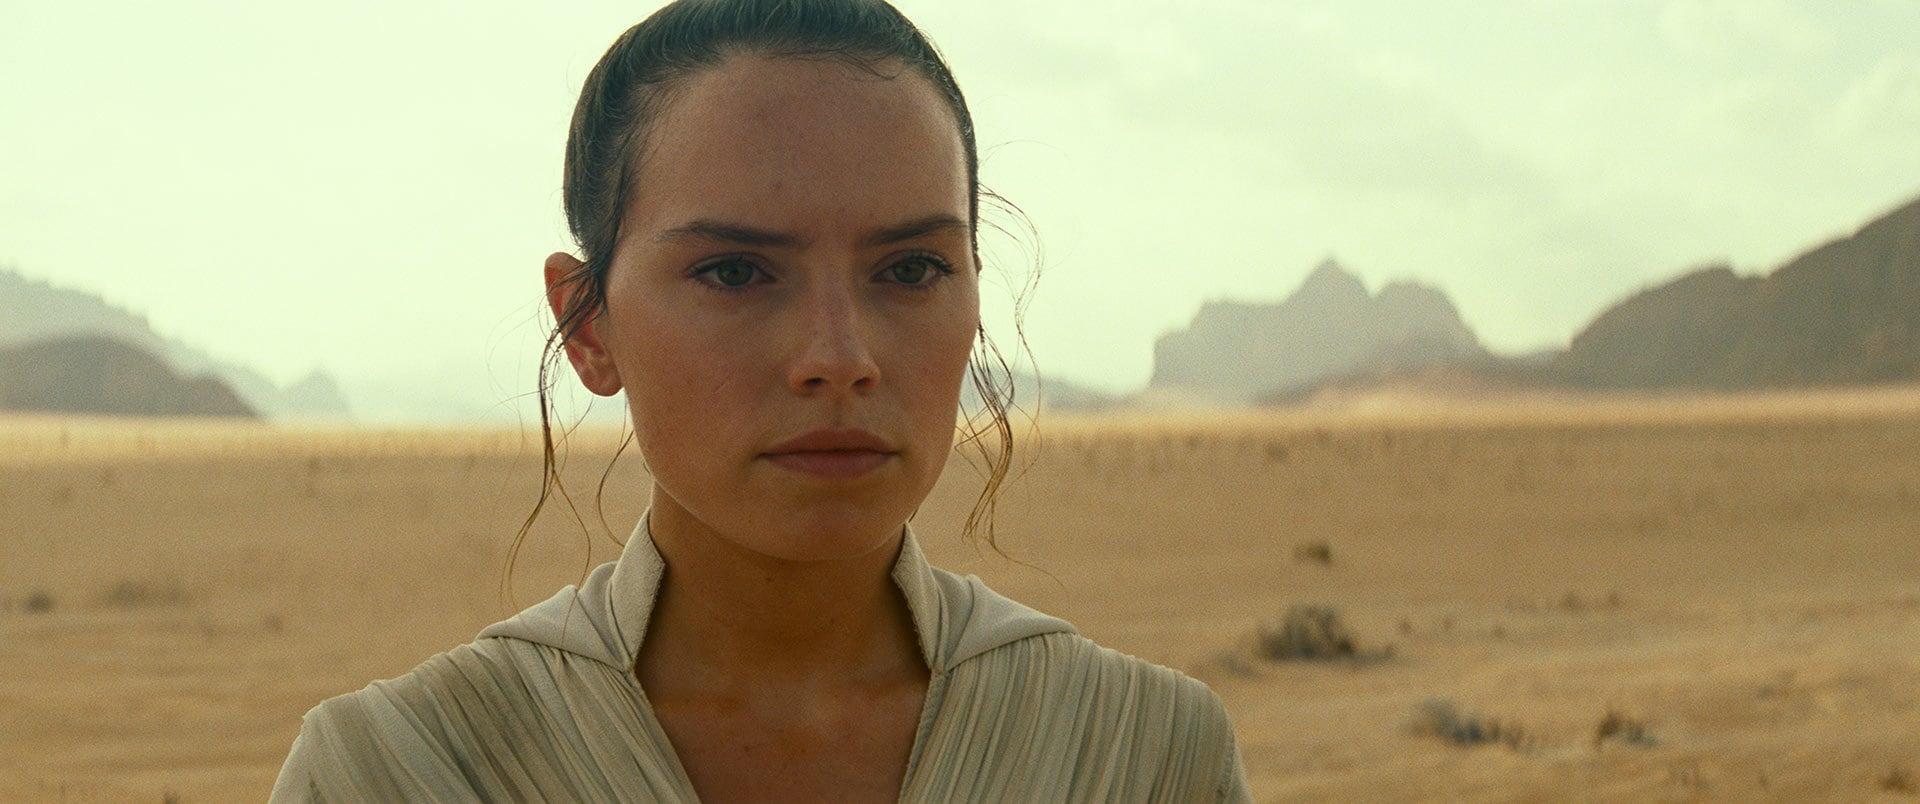 Star Wars: L'ascesa di Skywalker, debutta il nuovo trailer! thumbnail